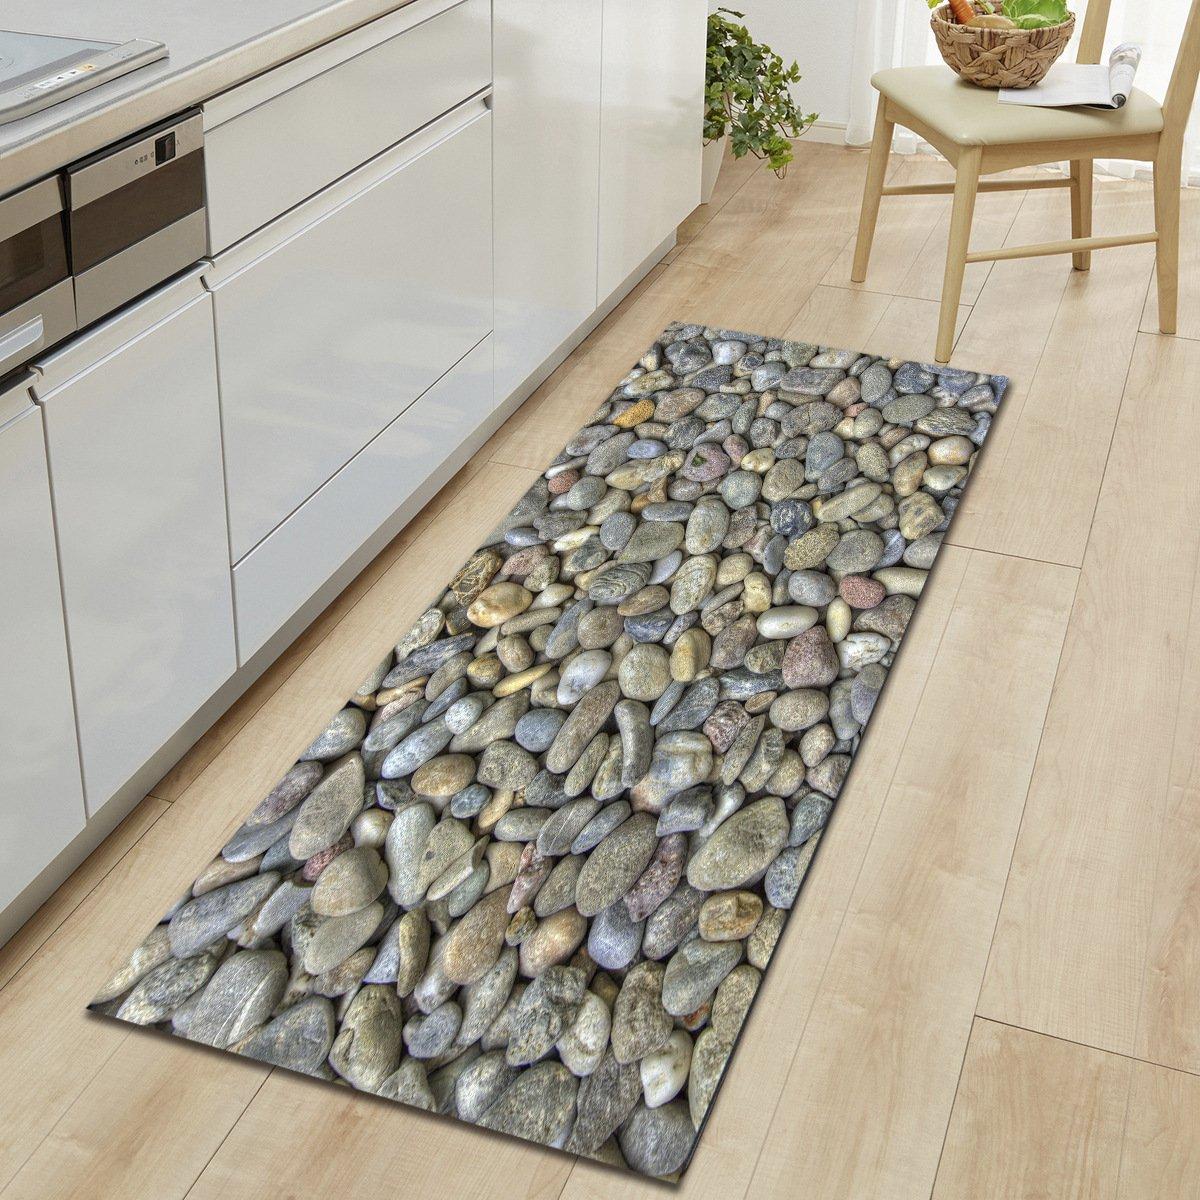 HYRL Carpets Alfombras De Pasillo Extra Largas para Baño Alfombra De Baño Antideslizante De Piedra para Baño Alfombra De Piso Absorbente De Cocina Lavable A Máquina,#1,60 * 90Cm